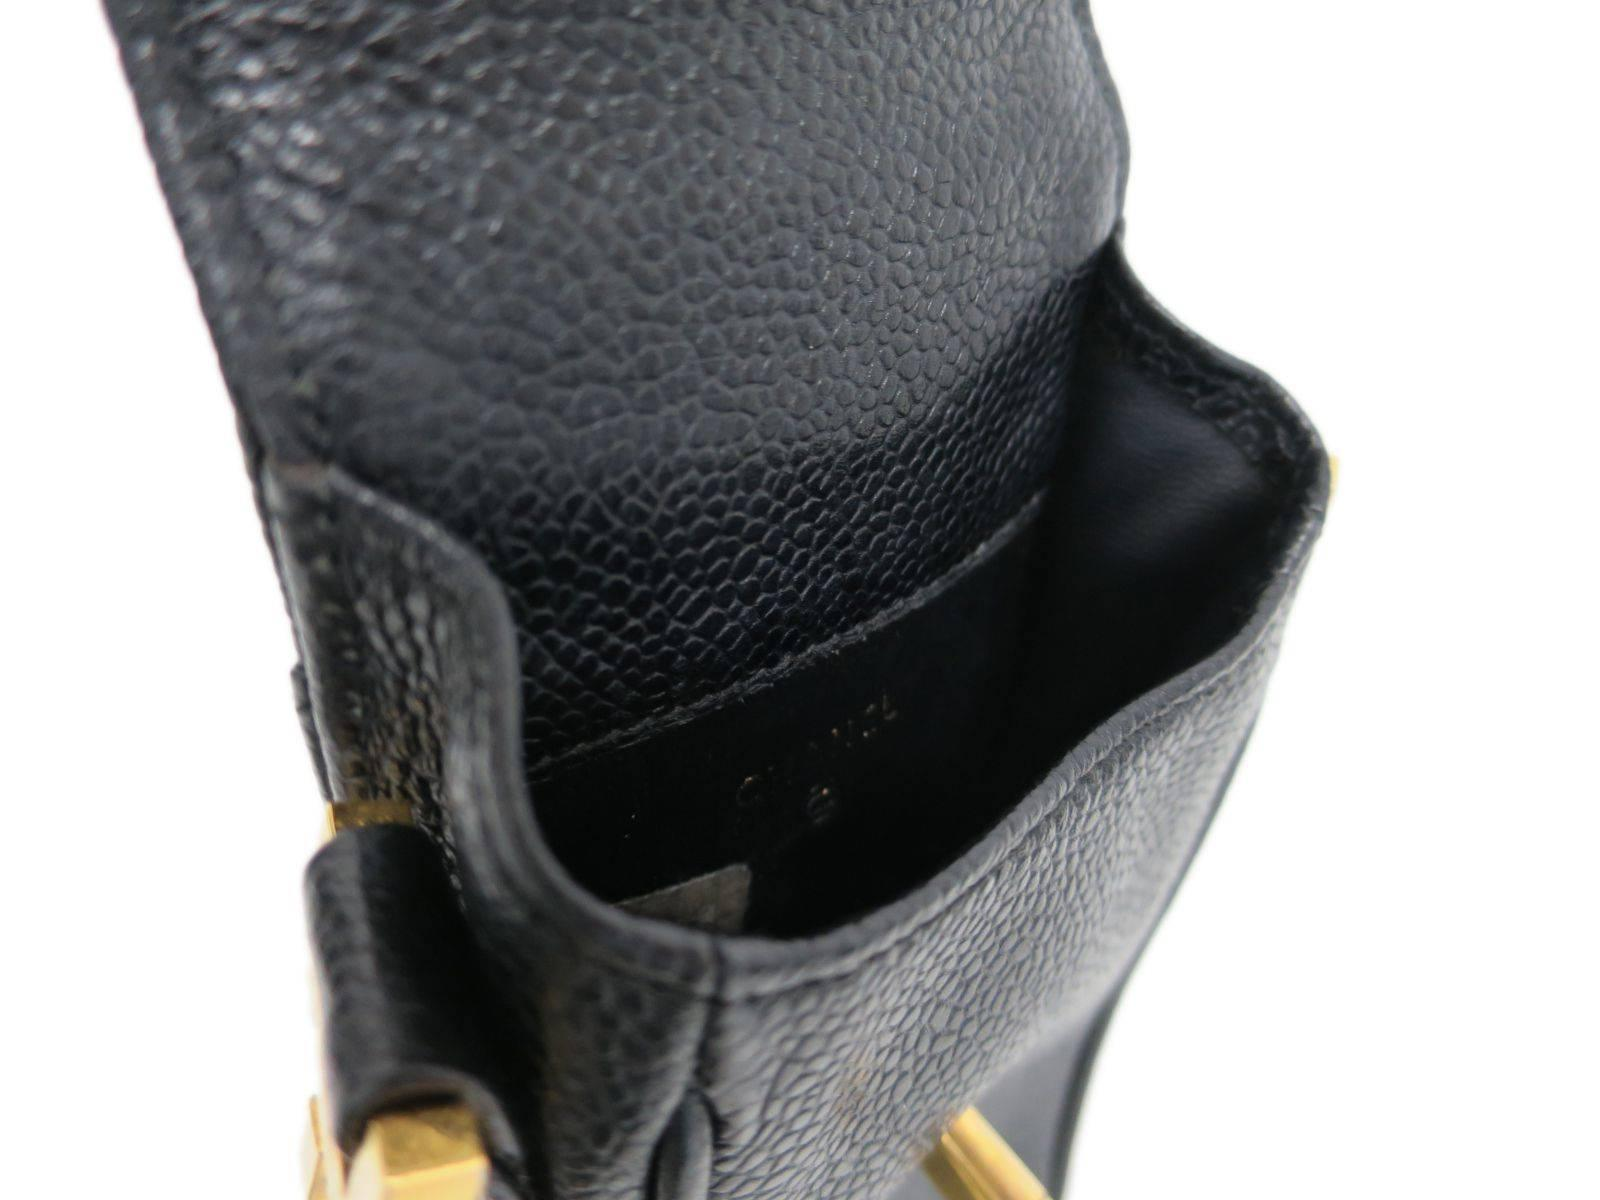 c763725b7be6 Chanel Black Caviar Leather Gold Hardware Phone Case Crossbody Shoulder Bag  at 1stdibs